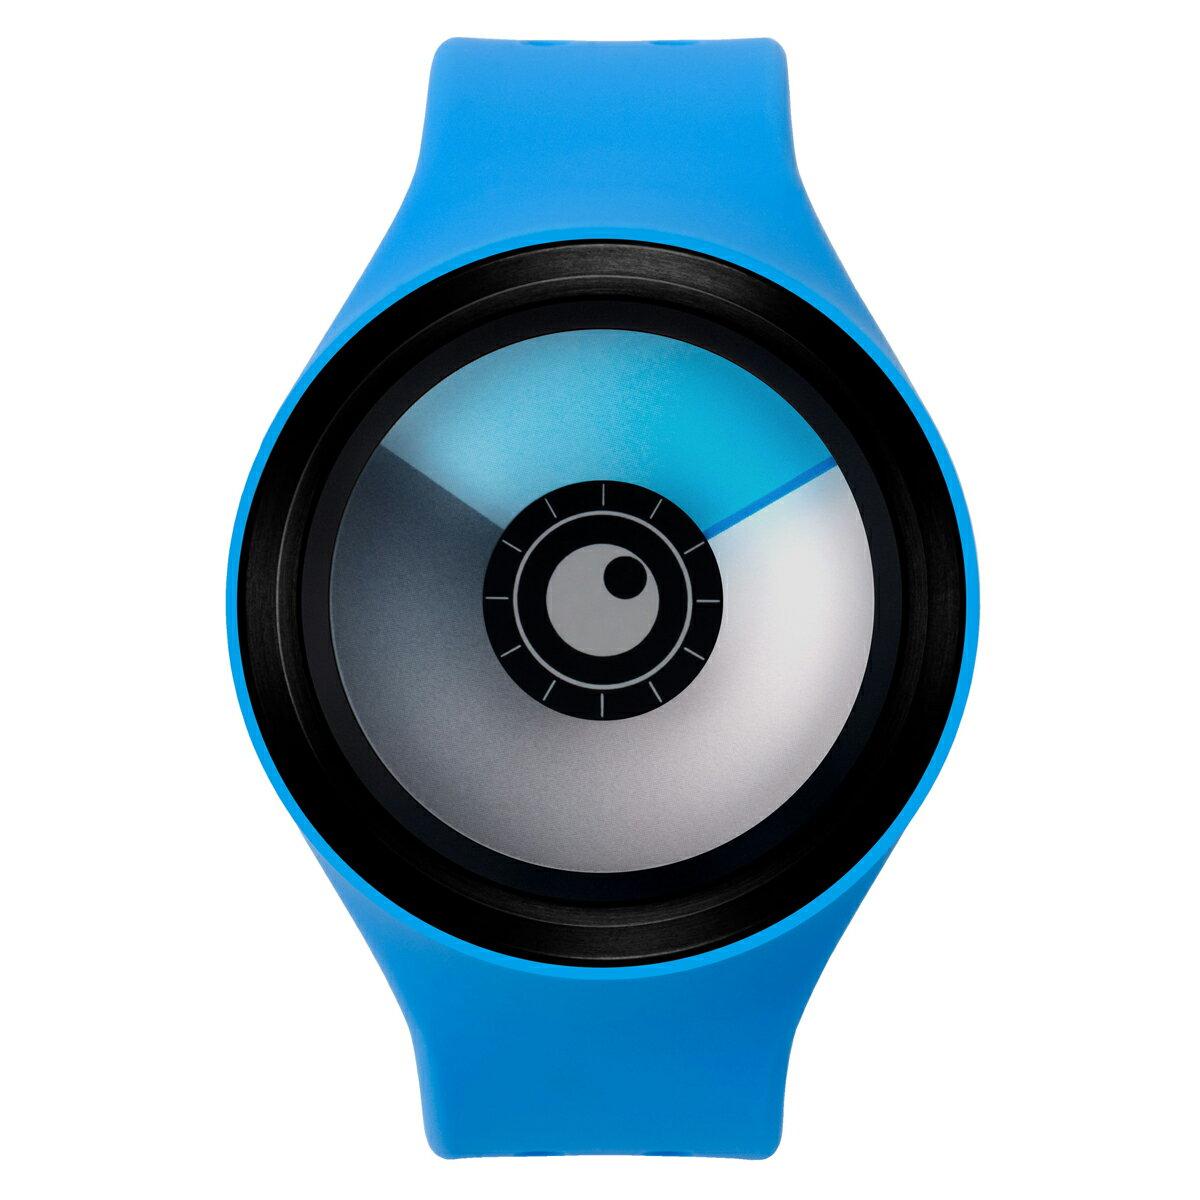 ZEROO AURORA BOREALIS ゼロ 電池式クォーツ 腕時計 [W00705B03SR04] ブルー デザインウォッチ ペア用 メンズ レディース ユニセックス おしゃれ時計 デザイナーズ